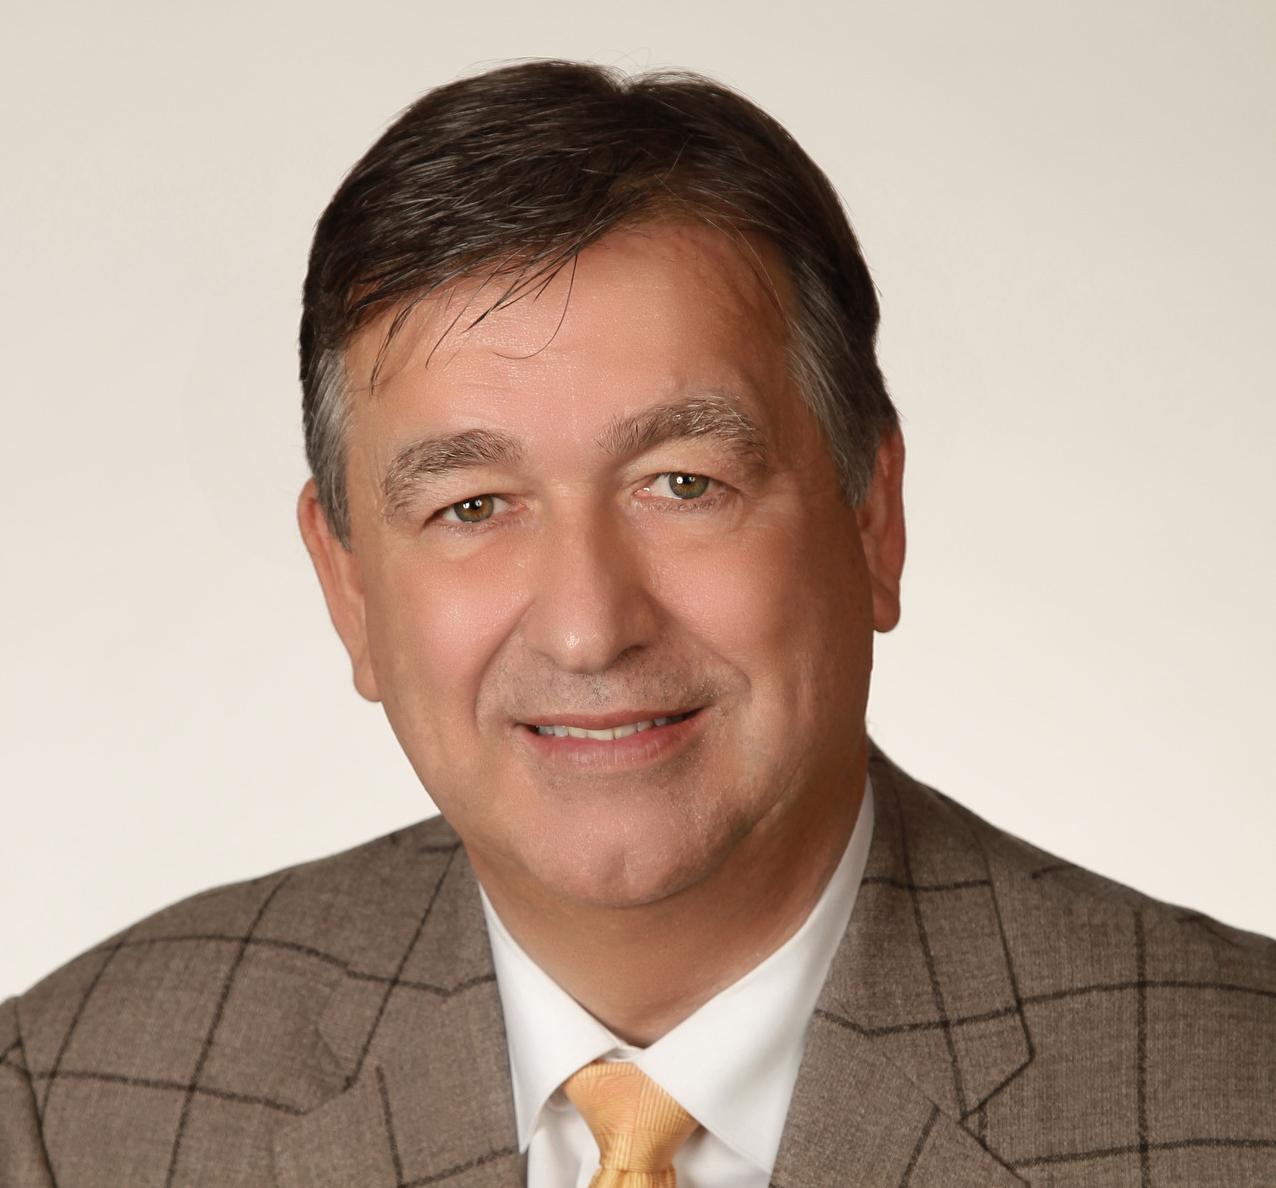 Laszlo L. Mechtler, MD